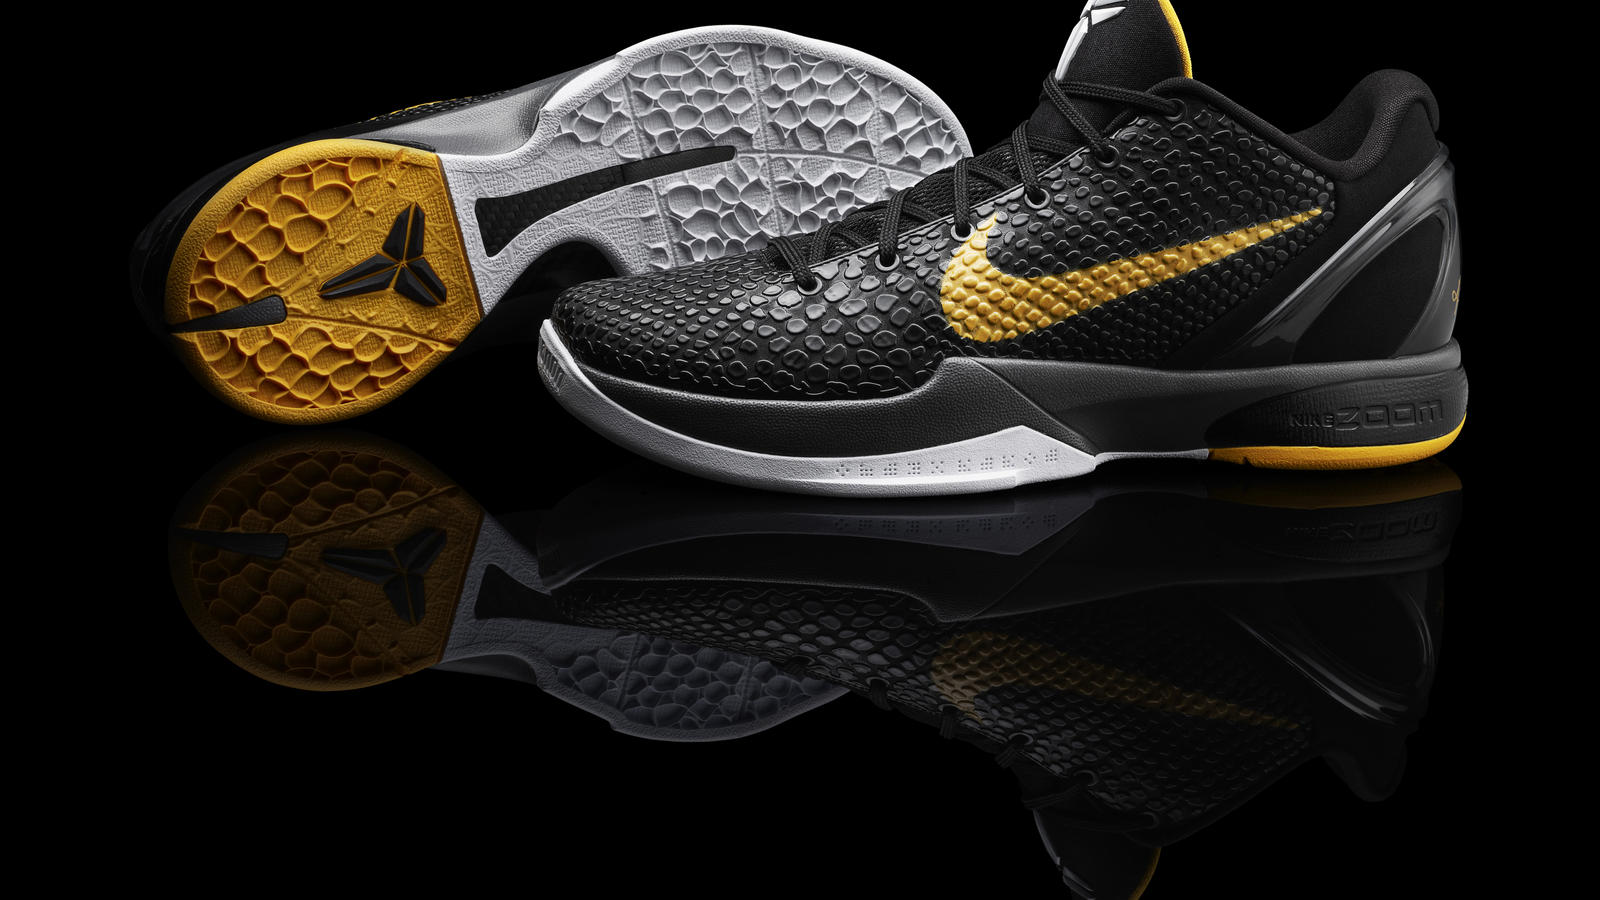 10106 Nike KobeVI Tech BLK. Nike Zoom Kobe VI Black Mamba bk.  10106 Nike KobeVI GN Pro. 10106 Nike KobeVI Details 194.  10106 Nike KobeVI Details 210 Lo 670ce746d